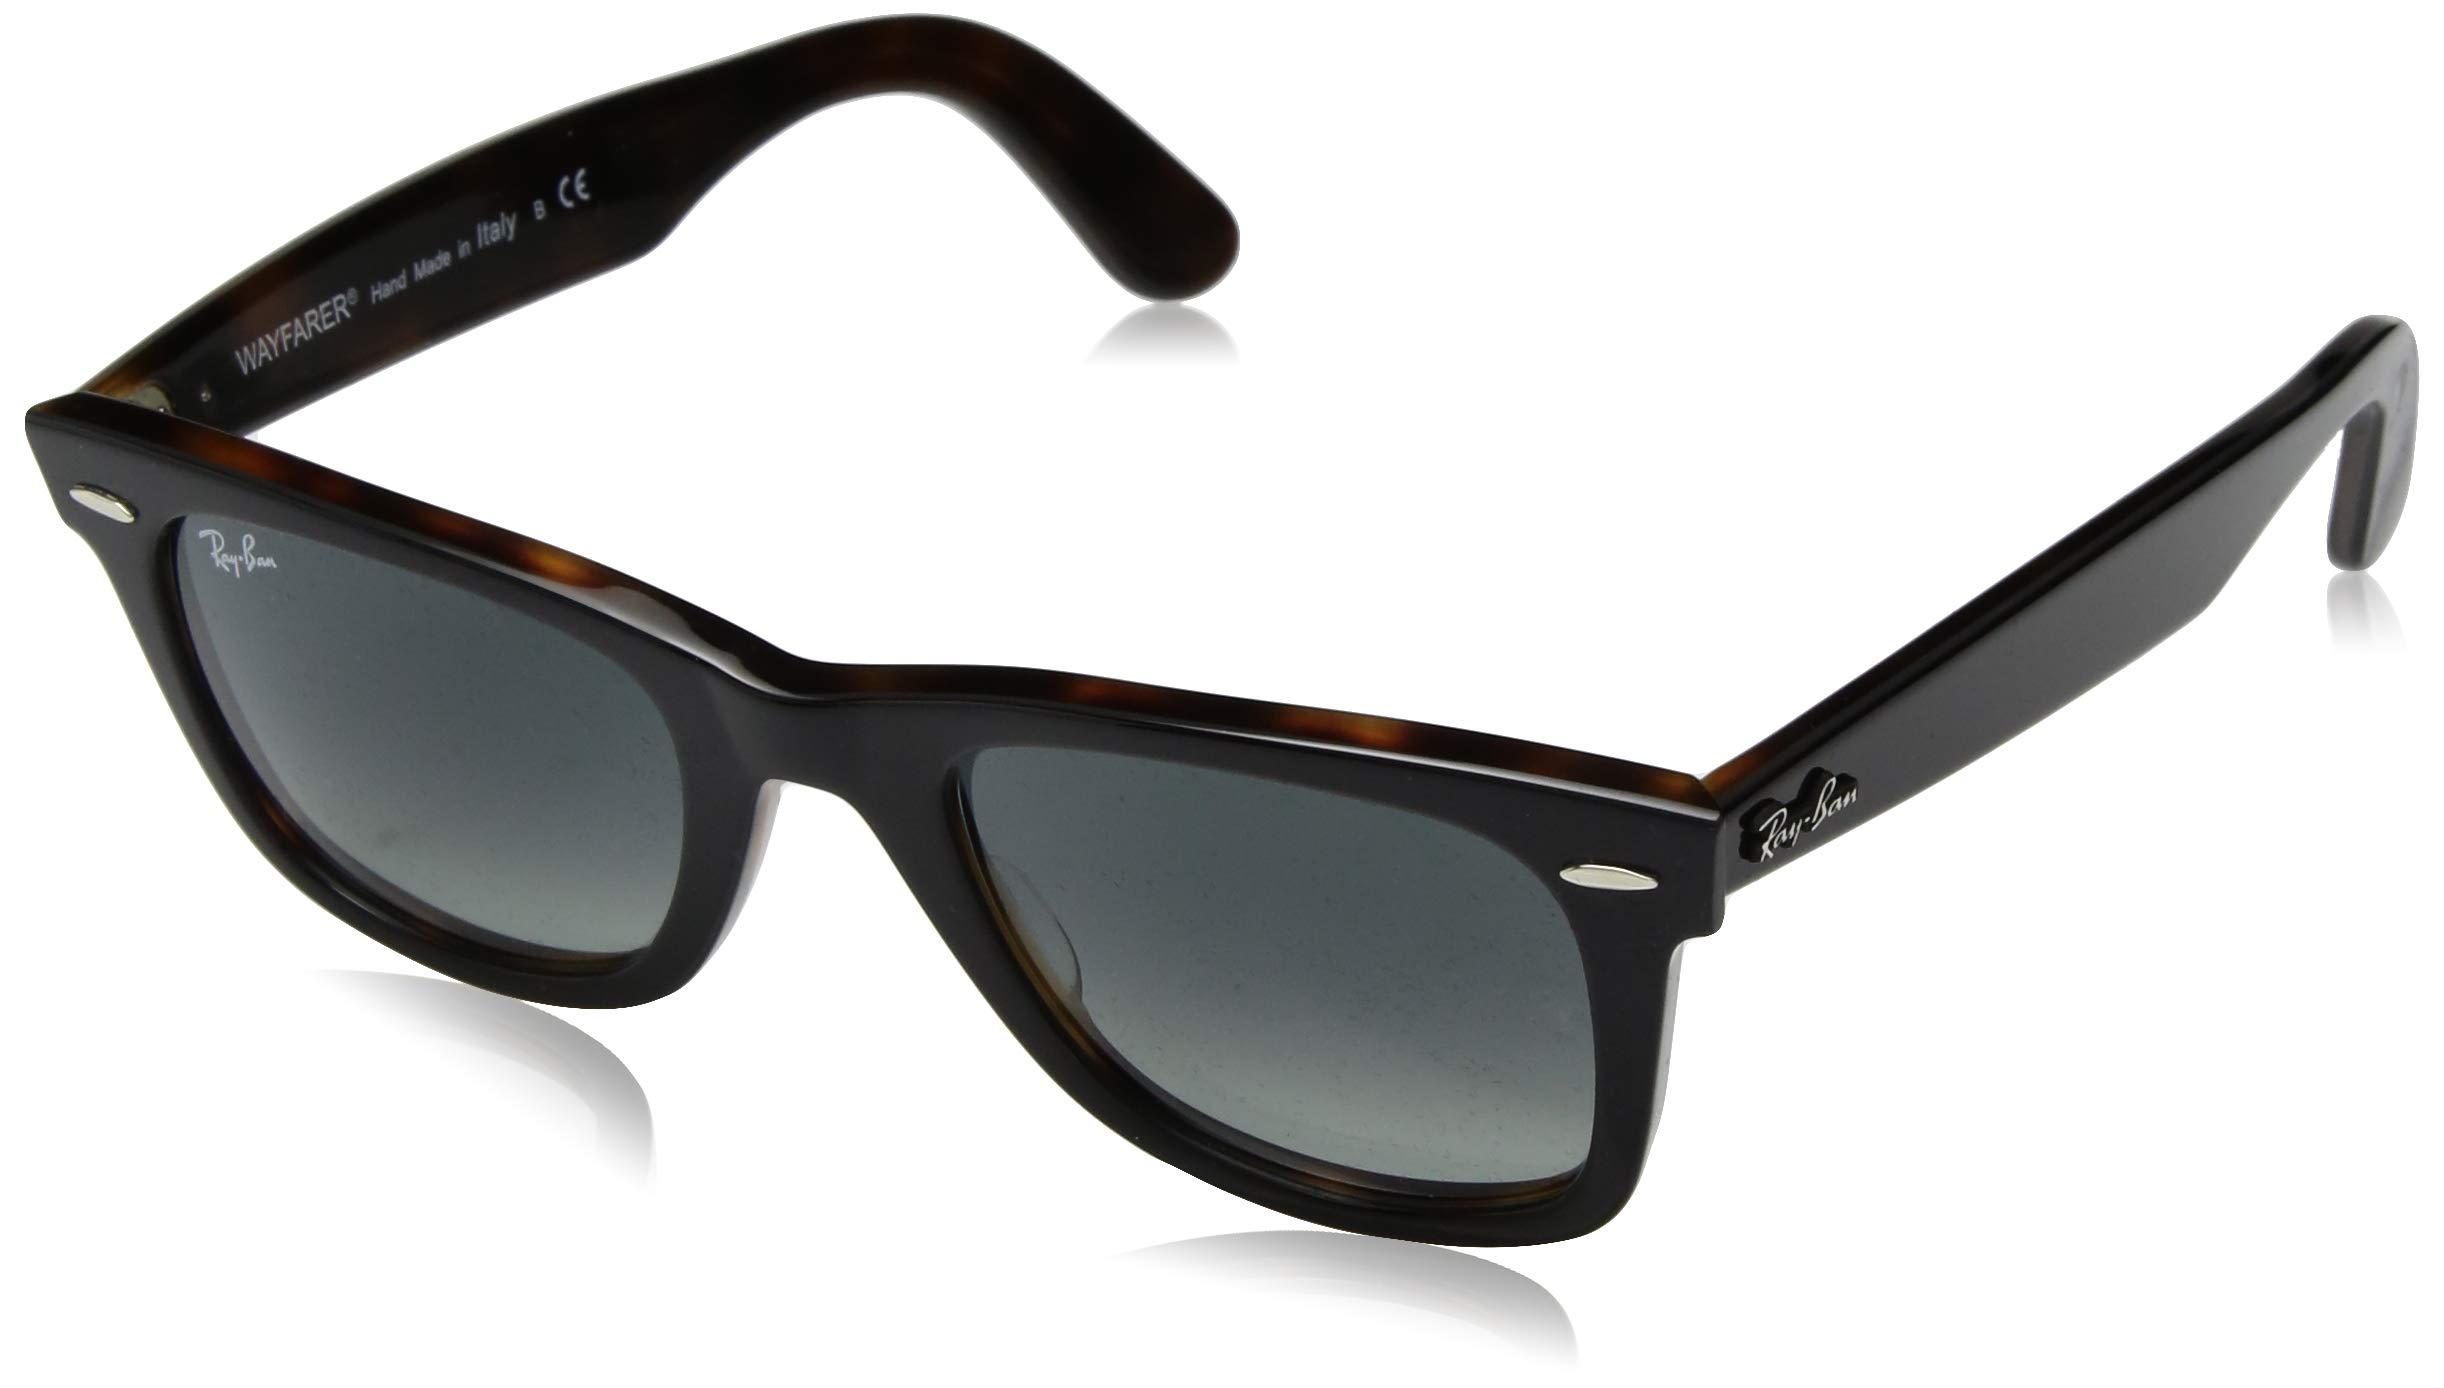 Ray-Ban Wayfarer Square Sunglasses, Top Grey on Havana, 50 mm